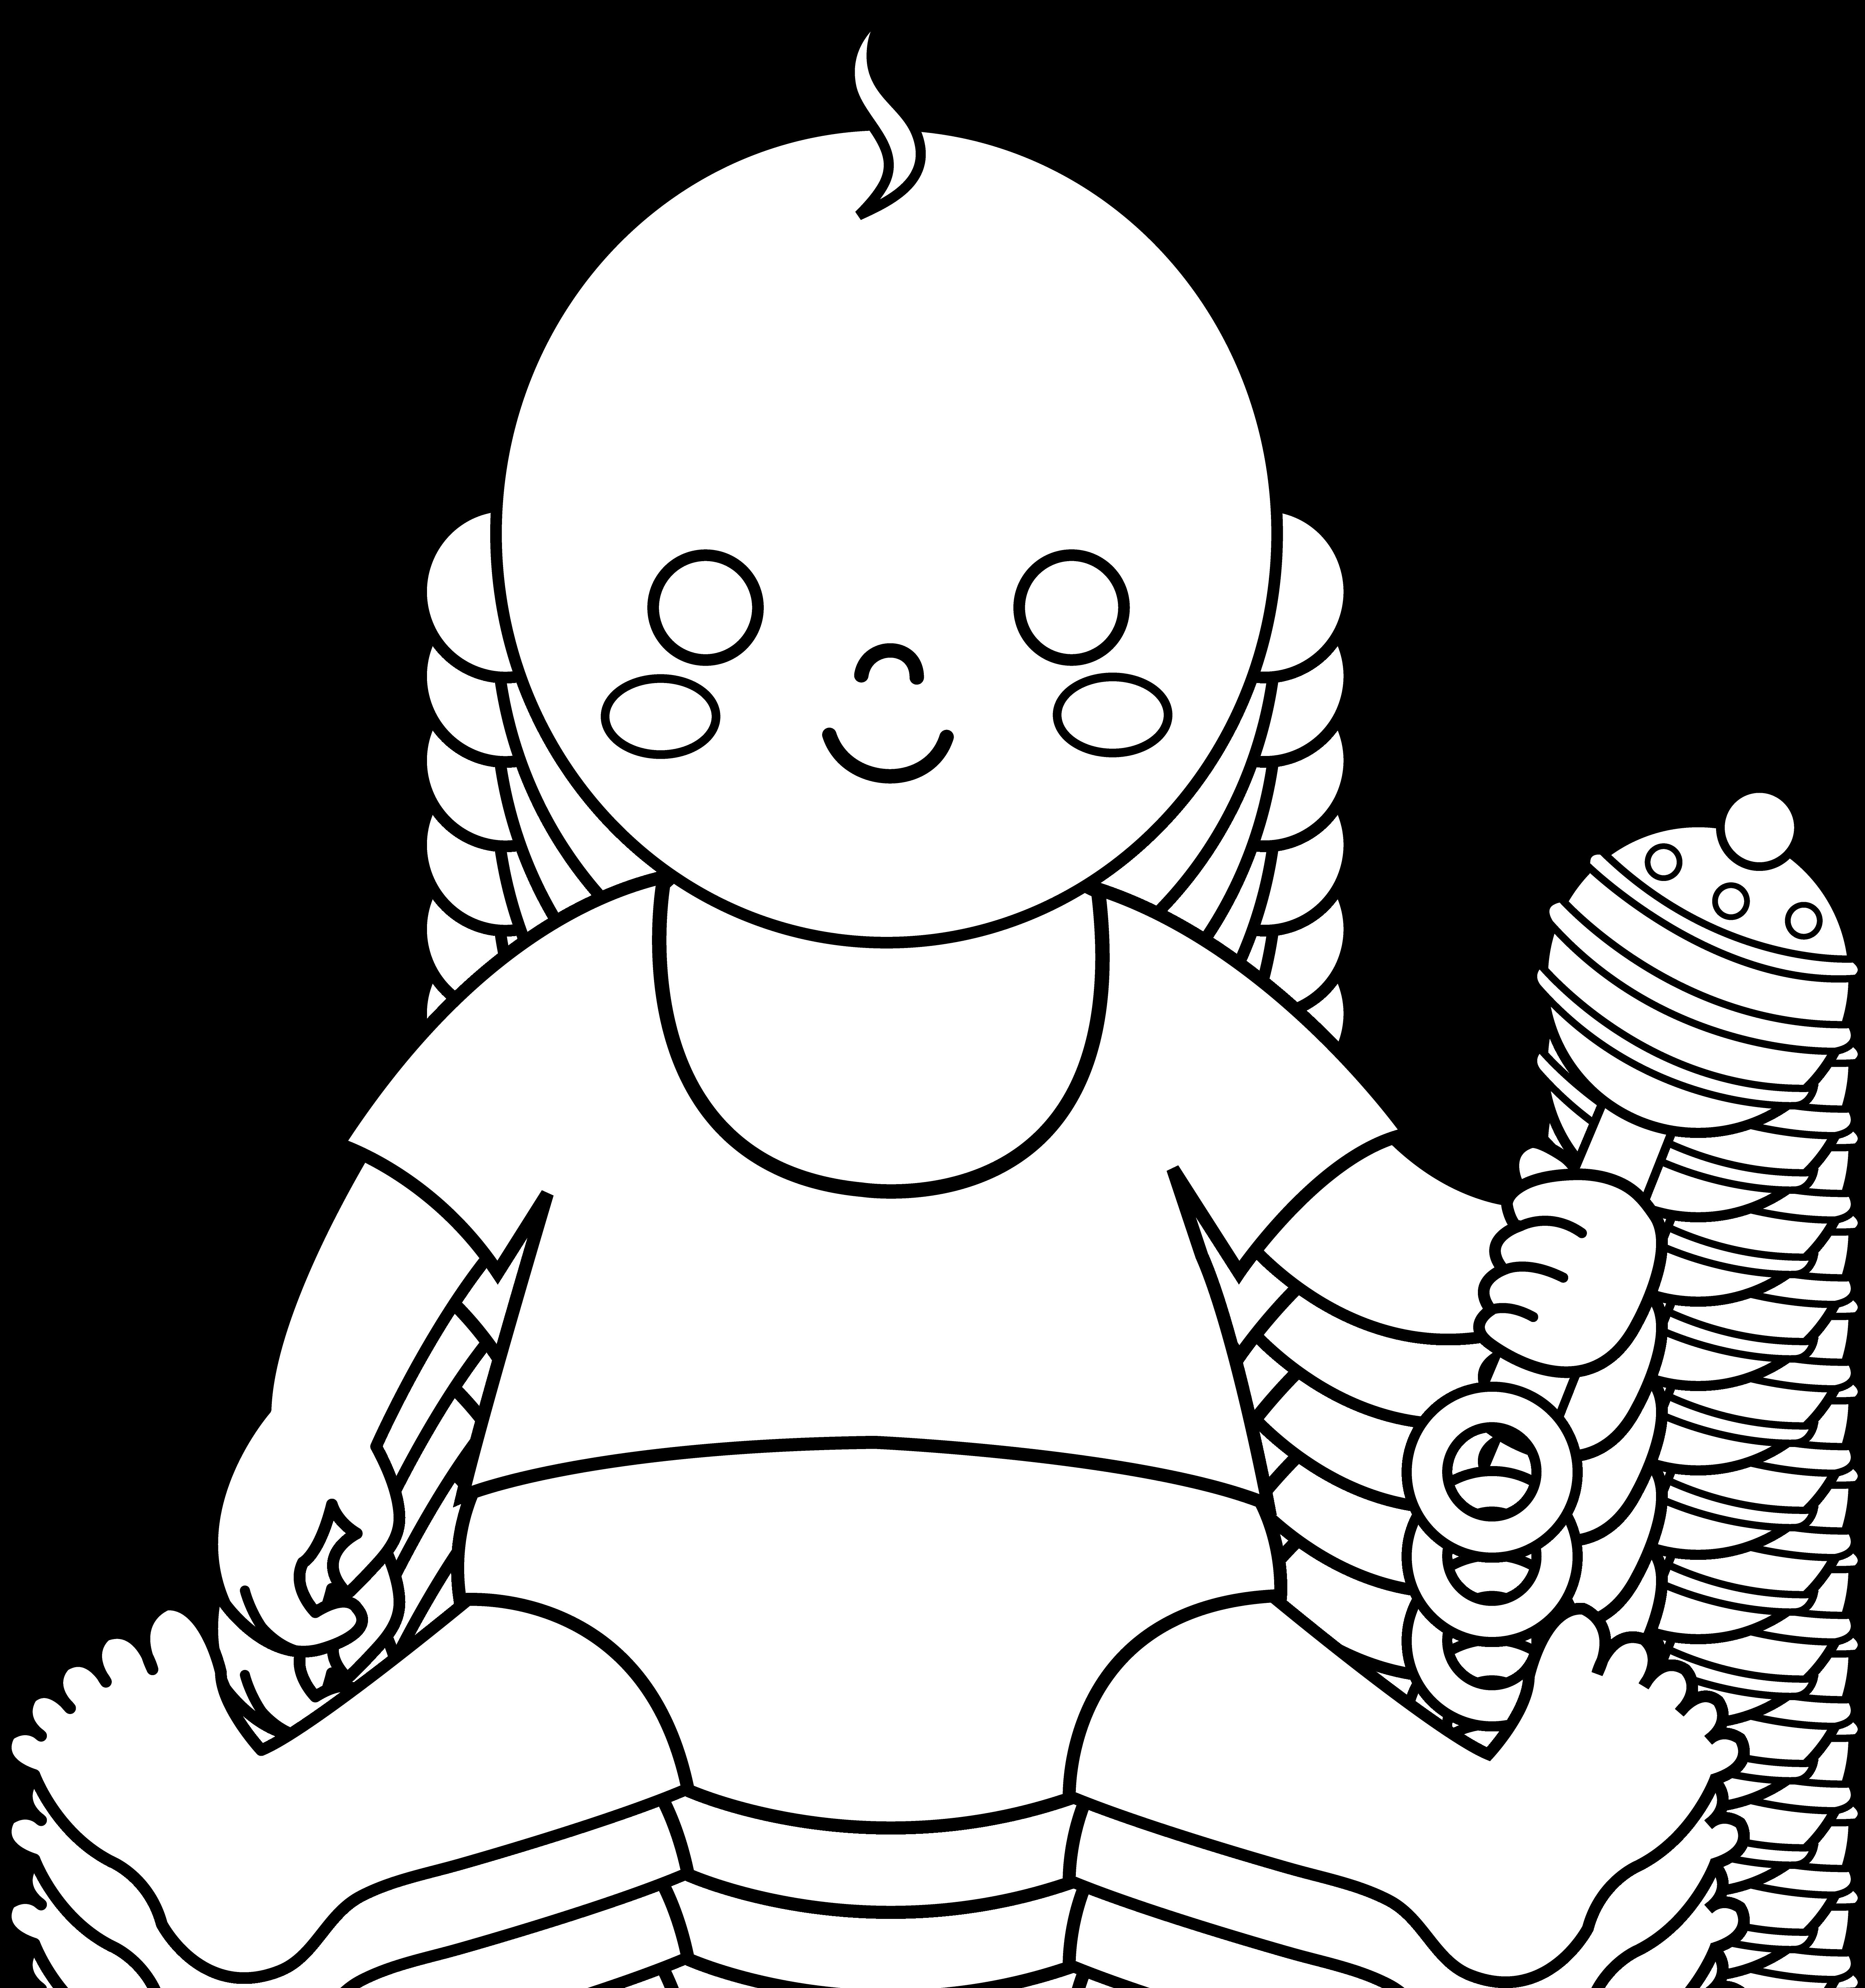 Free baby bib download. Diaper clipart cartoon little girl